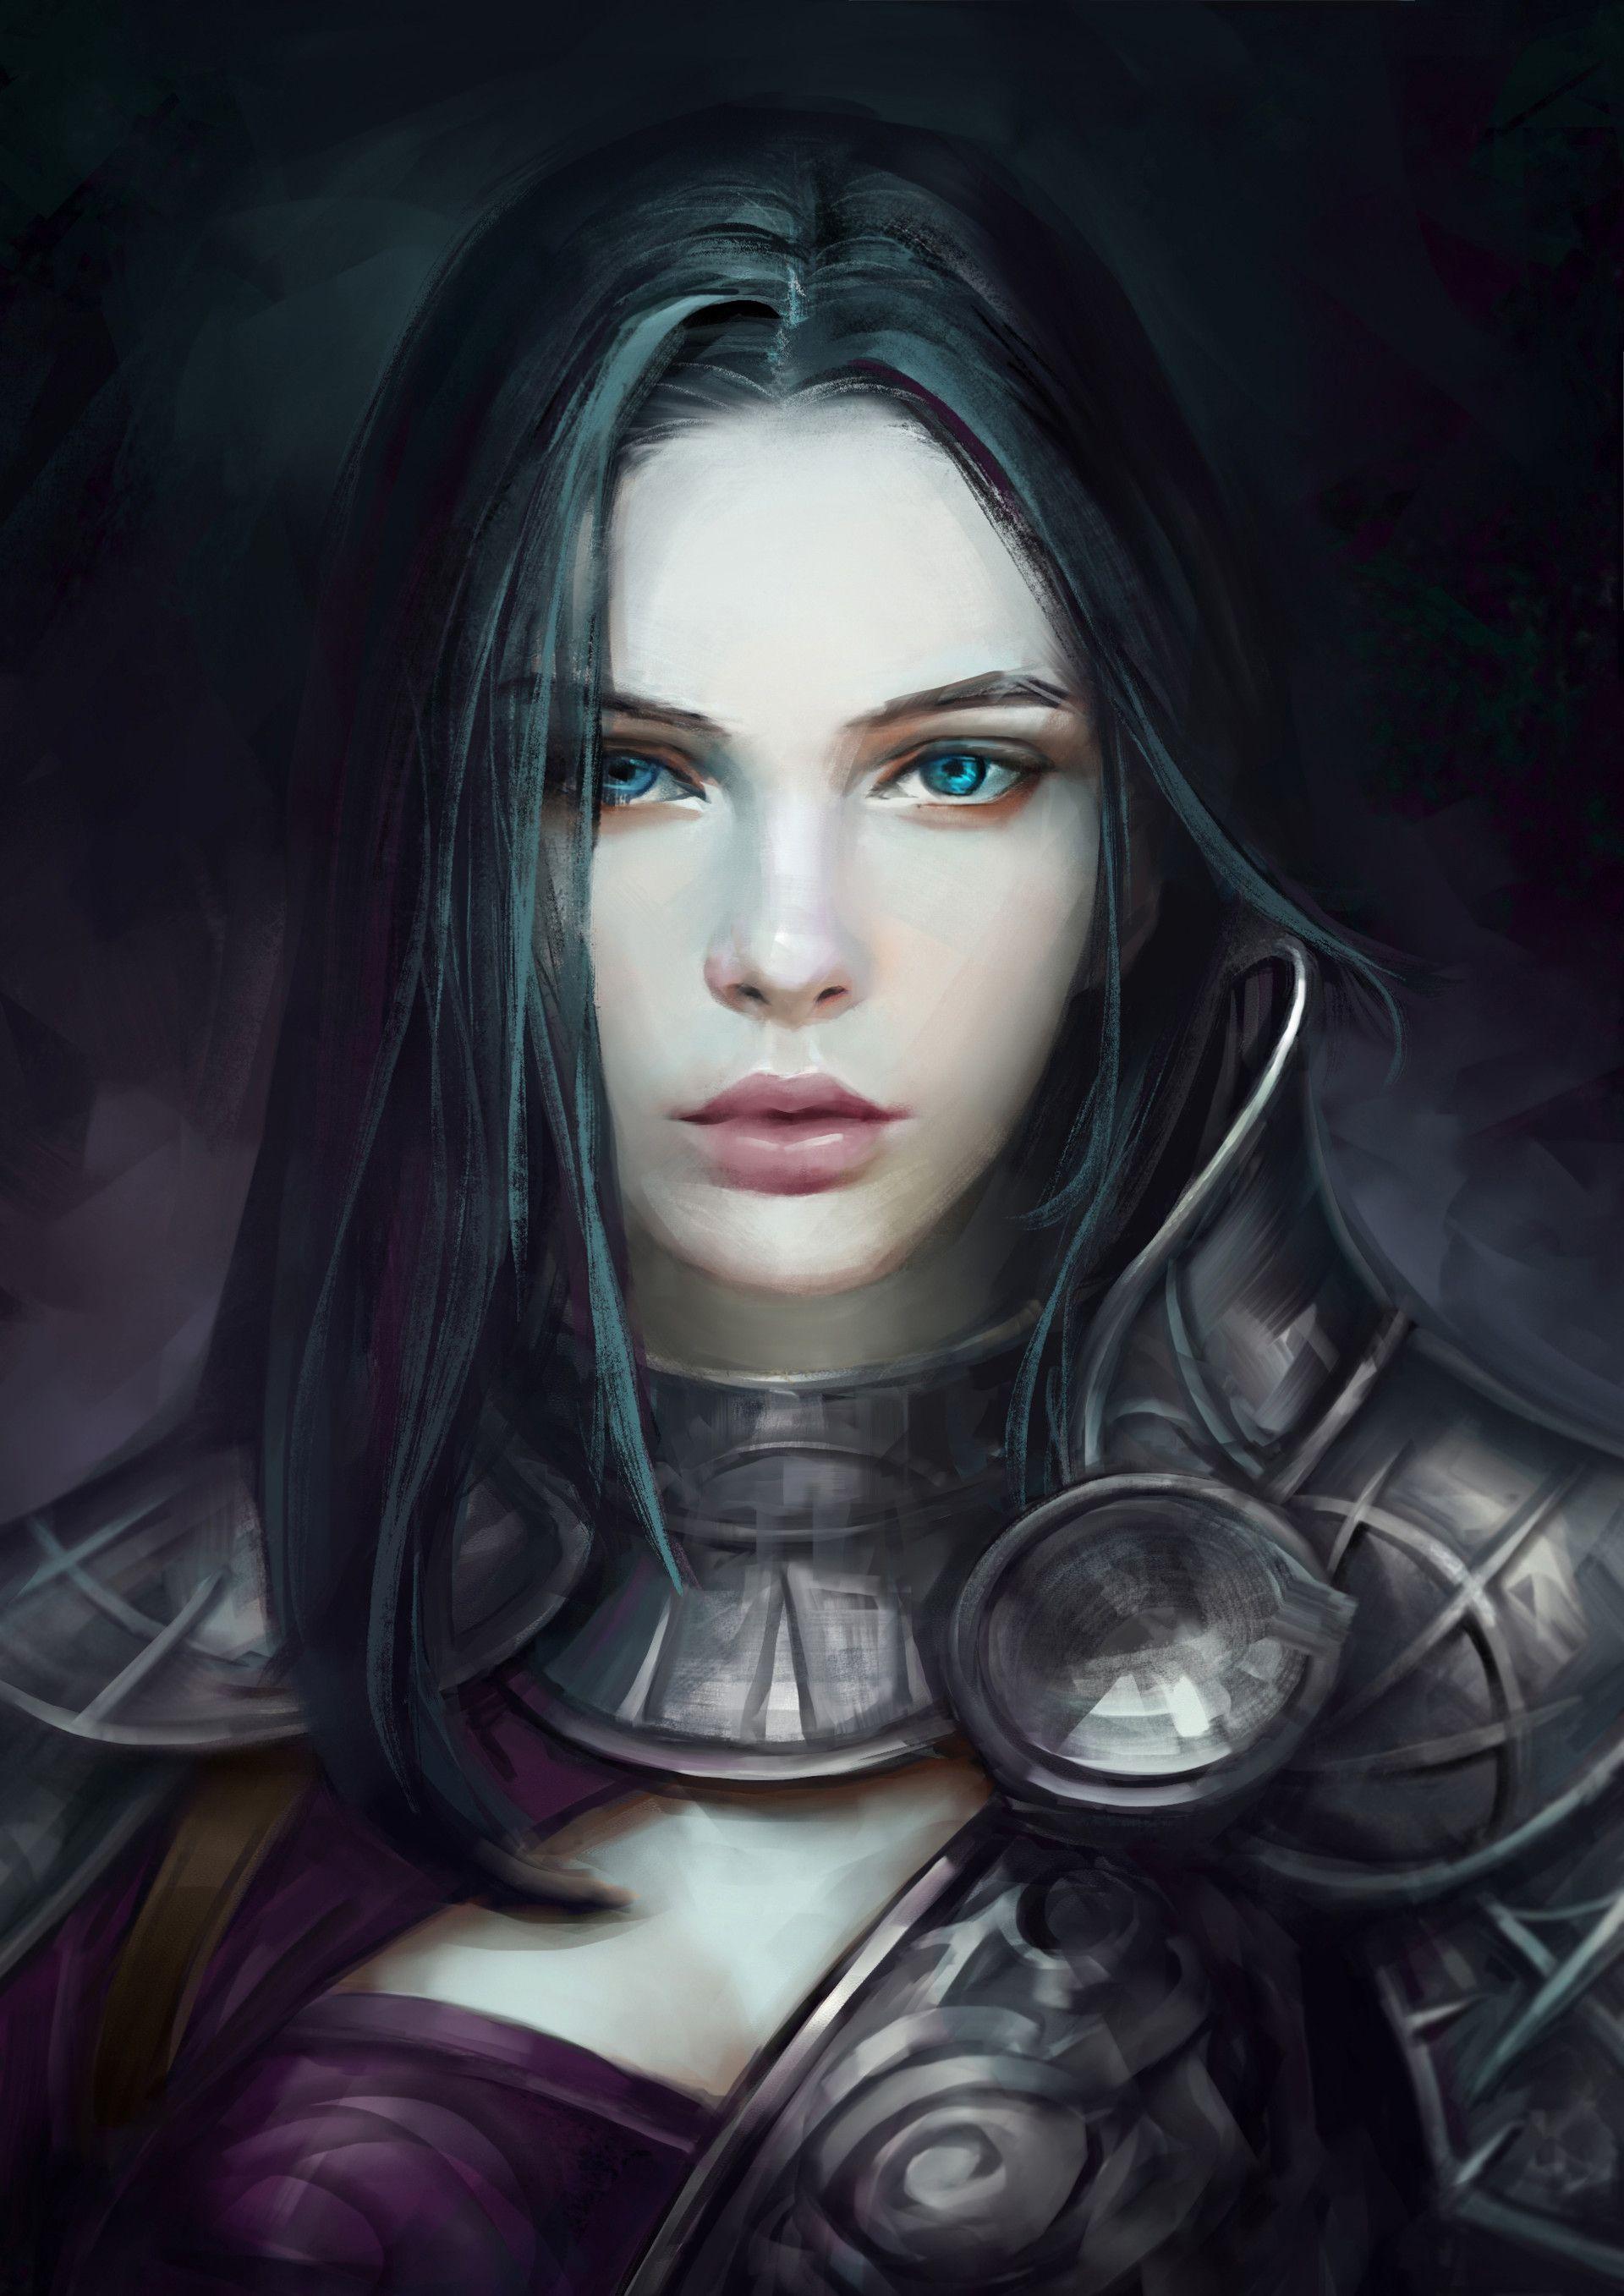 women fantasy eyes blue - photo #19